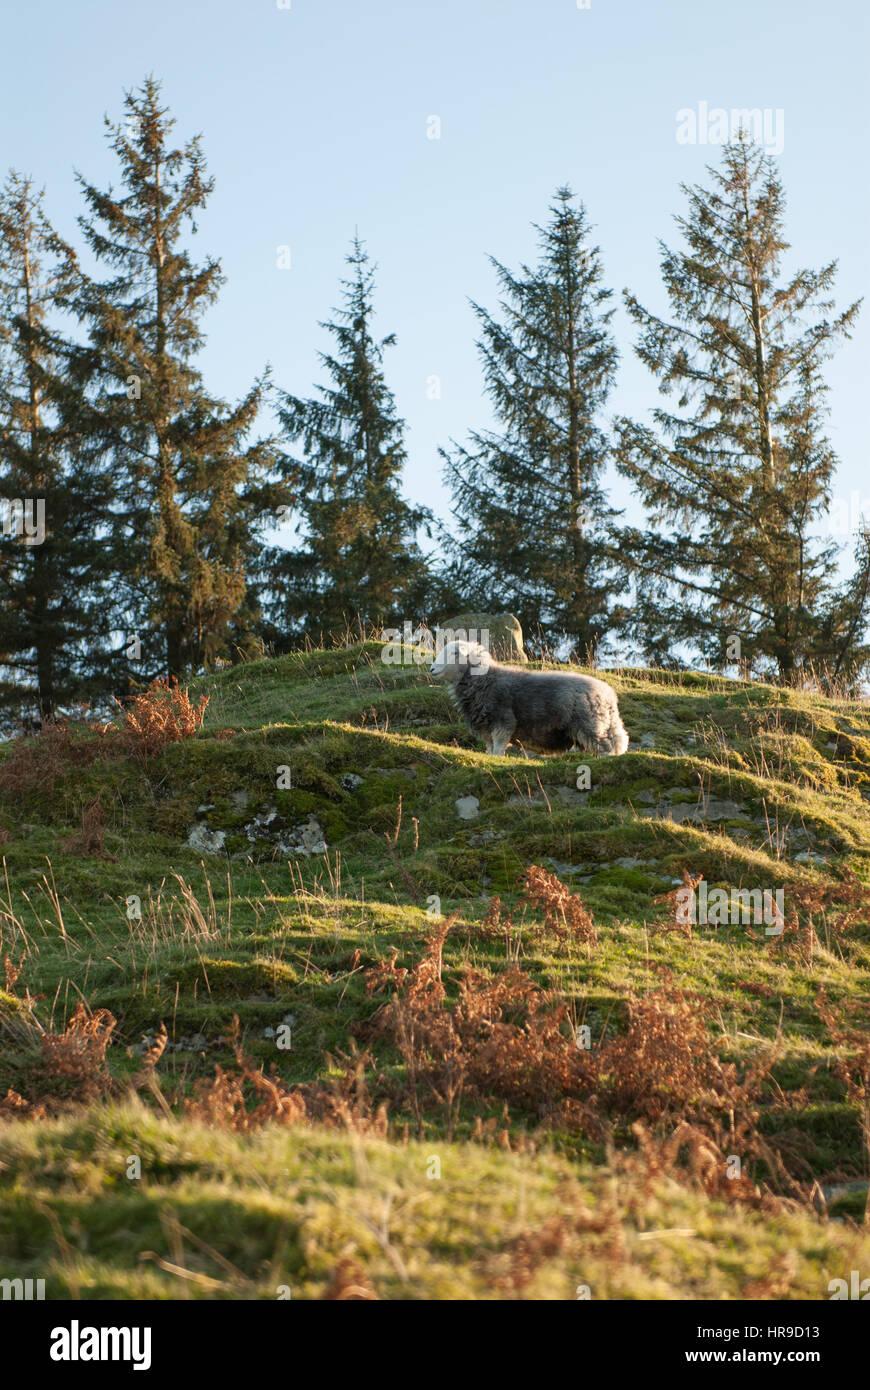 Sheep in Tarn Hows, The Lake District, Cumbria, England. U - Stock Image